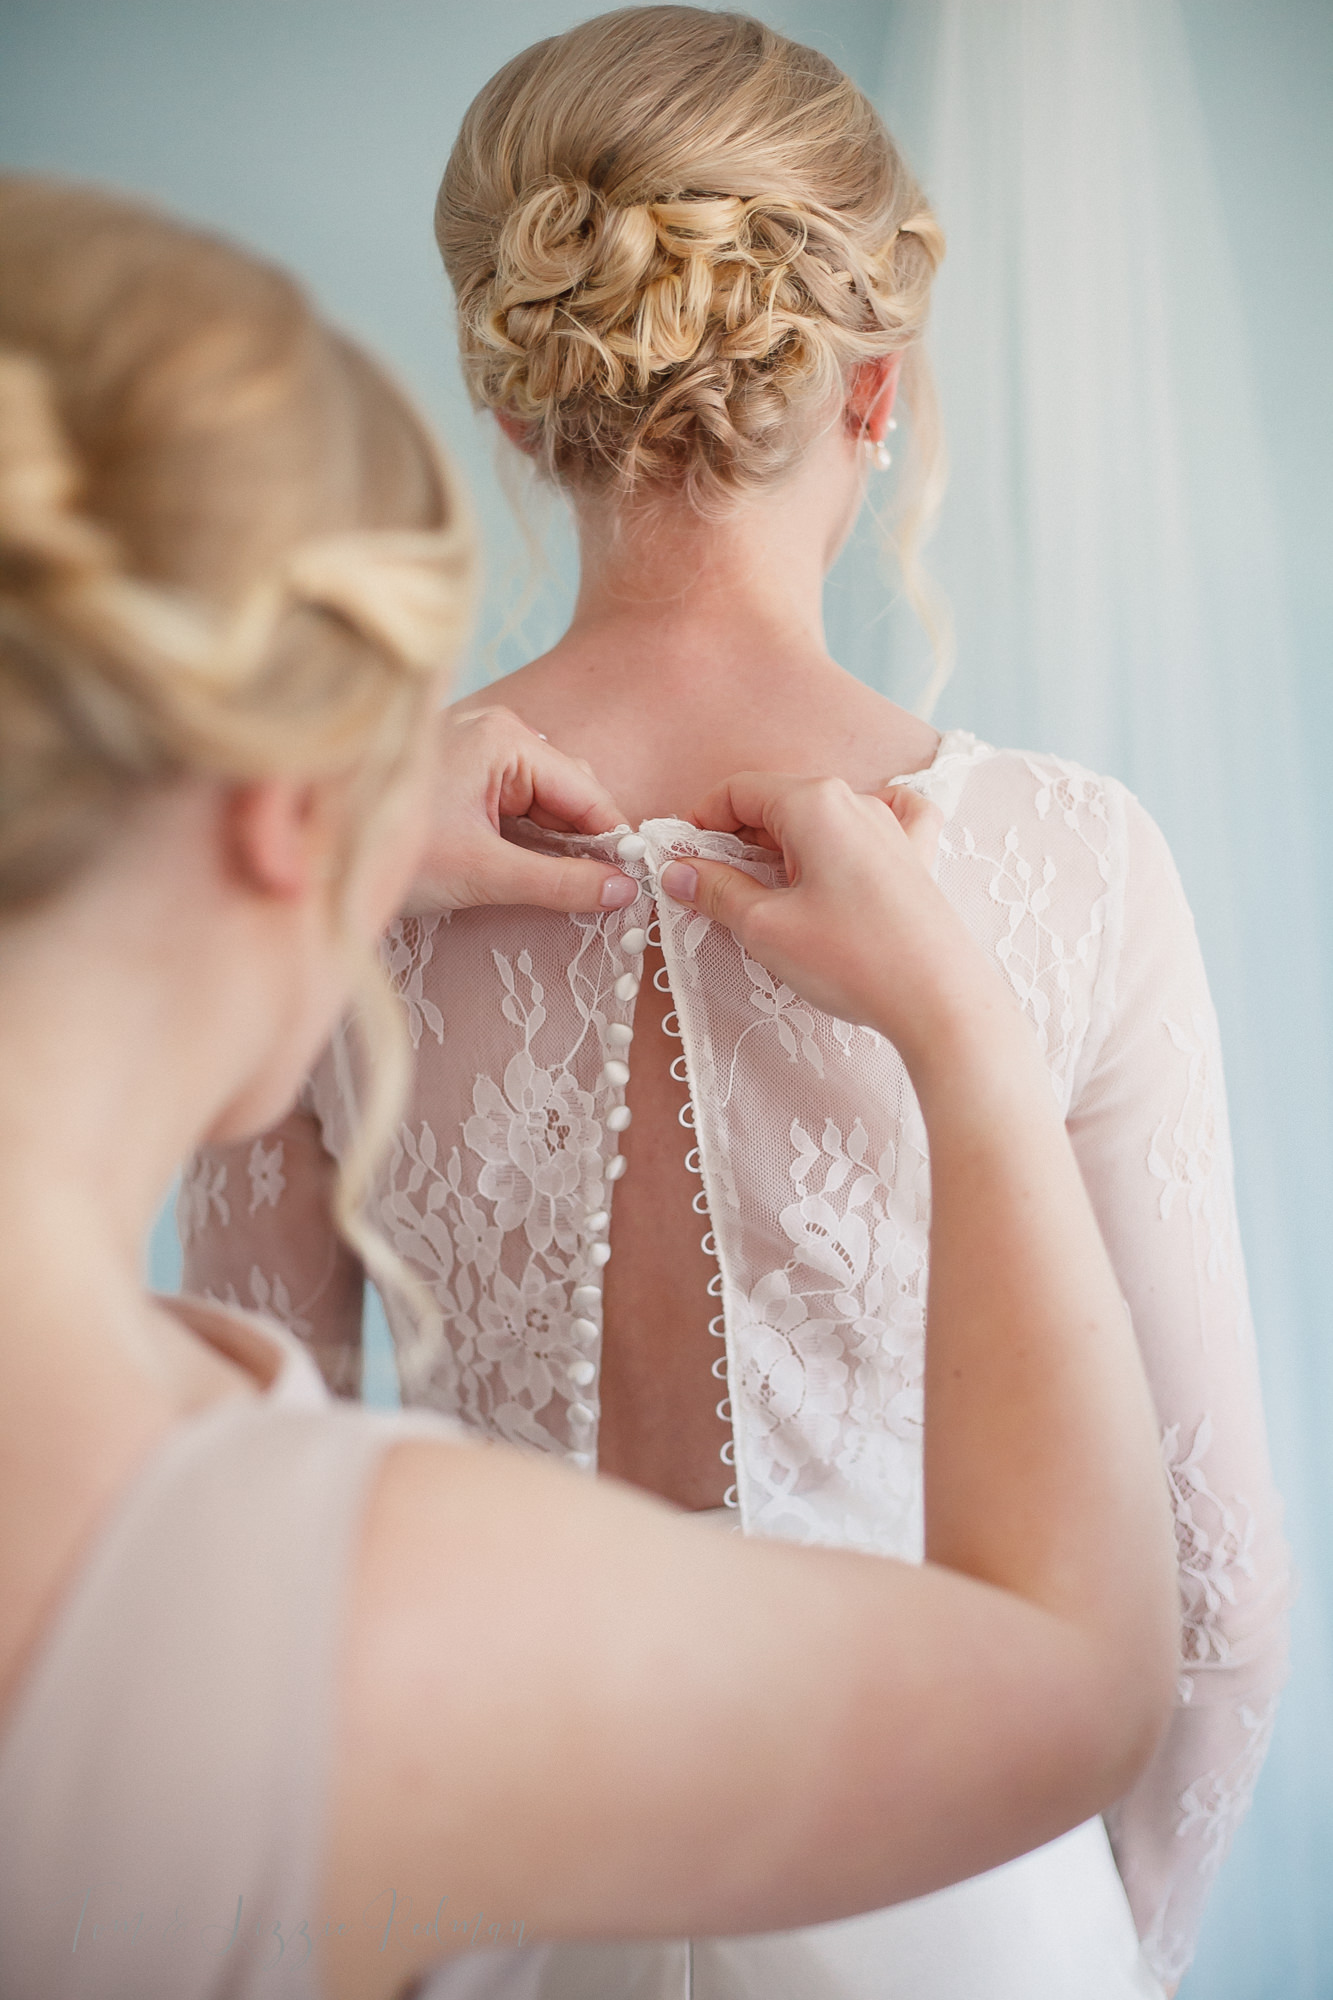 Dorset wedding photographers Tom & Lizzie Redman 007.jpg